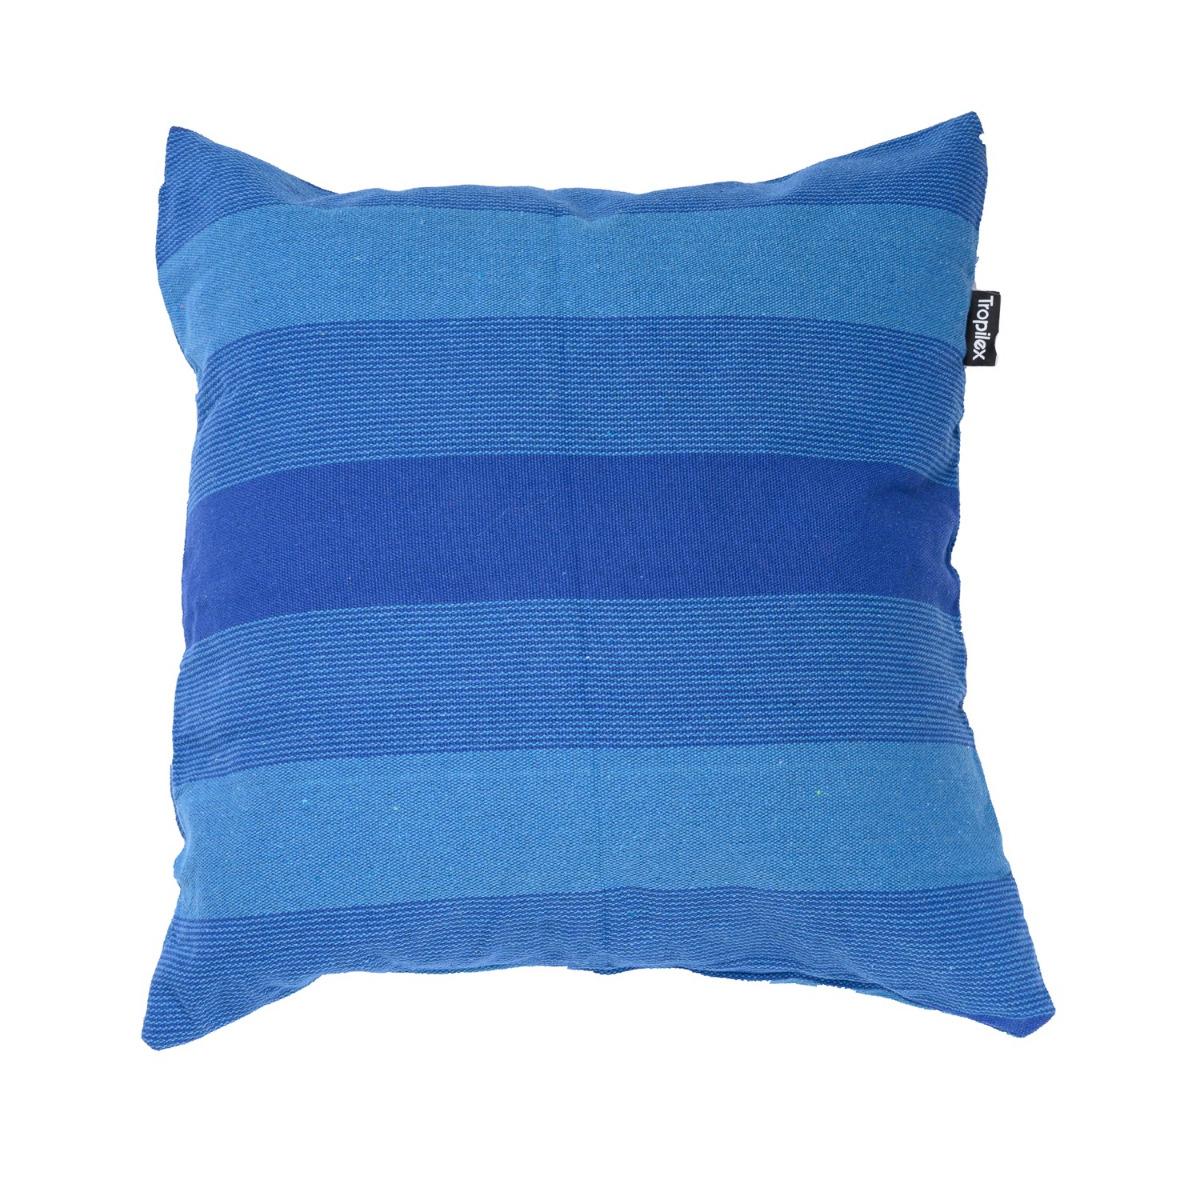 Kussen 'Dream' Blue - Tropilex �